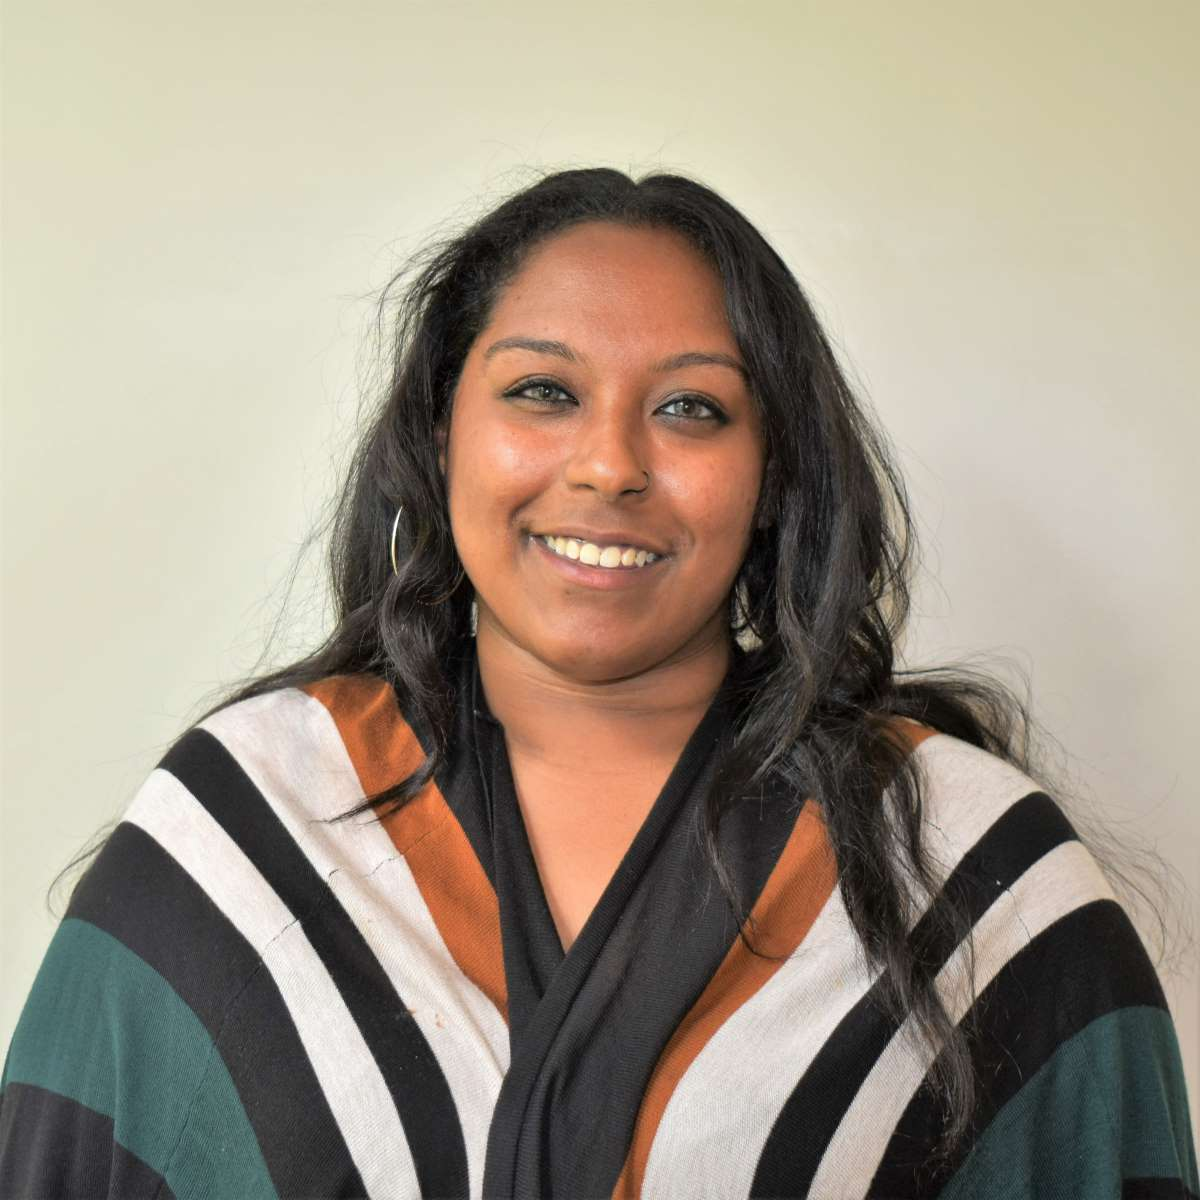 Shereen Rehman, B.A